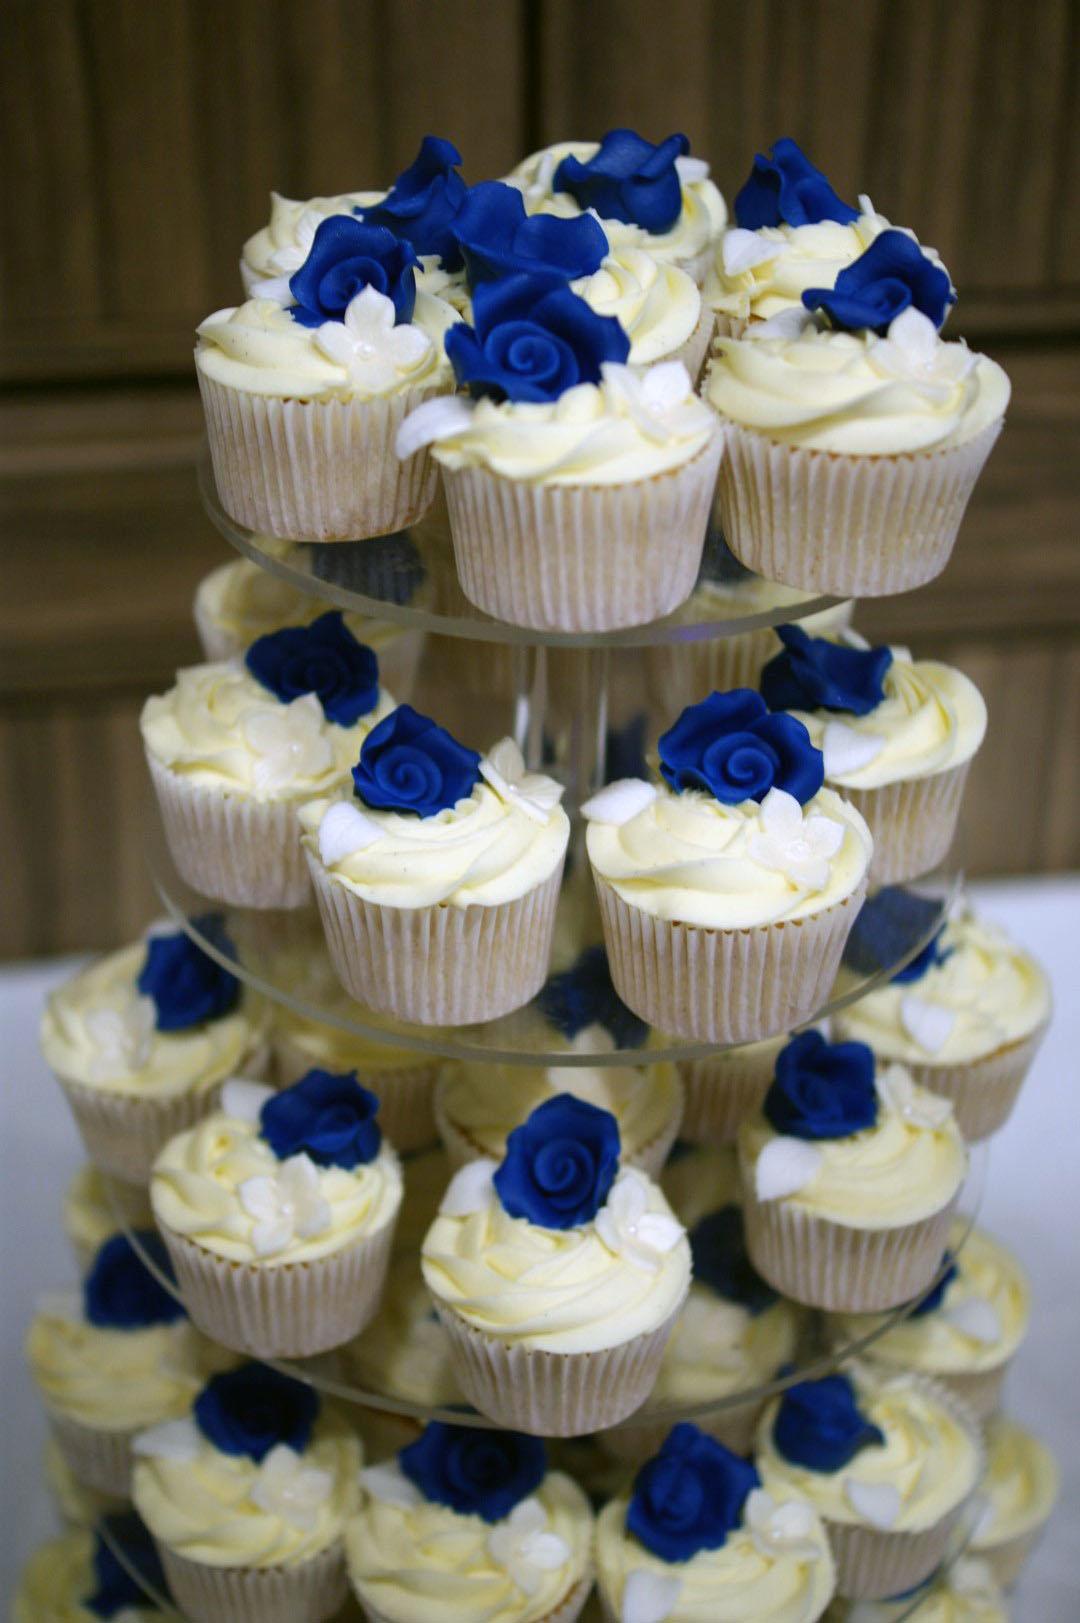 3 Tier Wedding Cake with Cupcake Tower - Bakealous